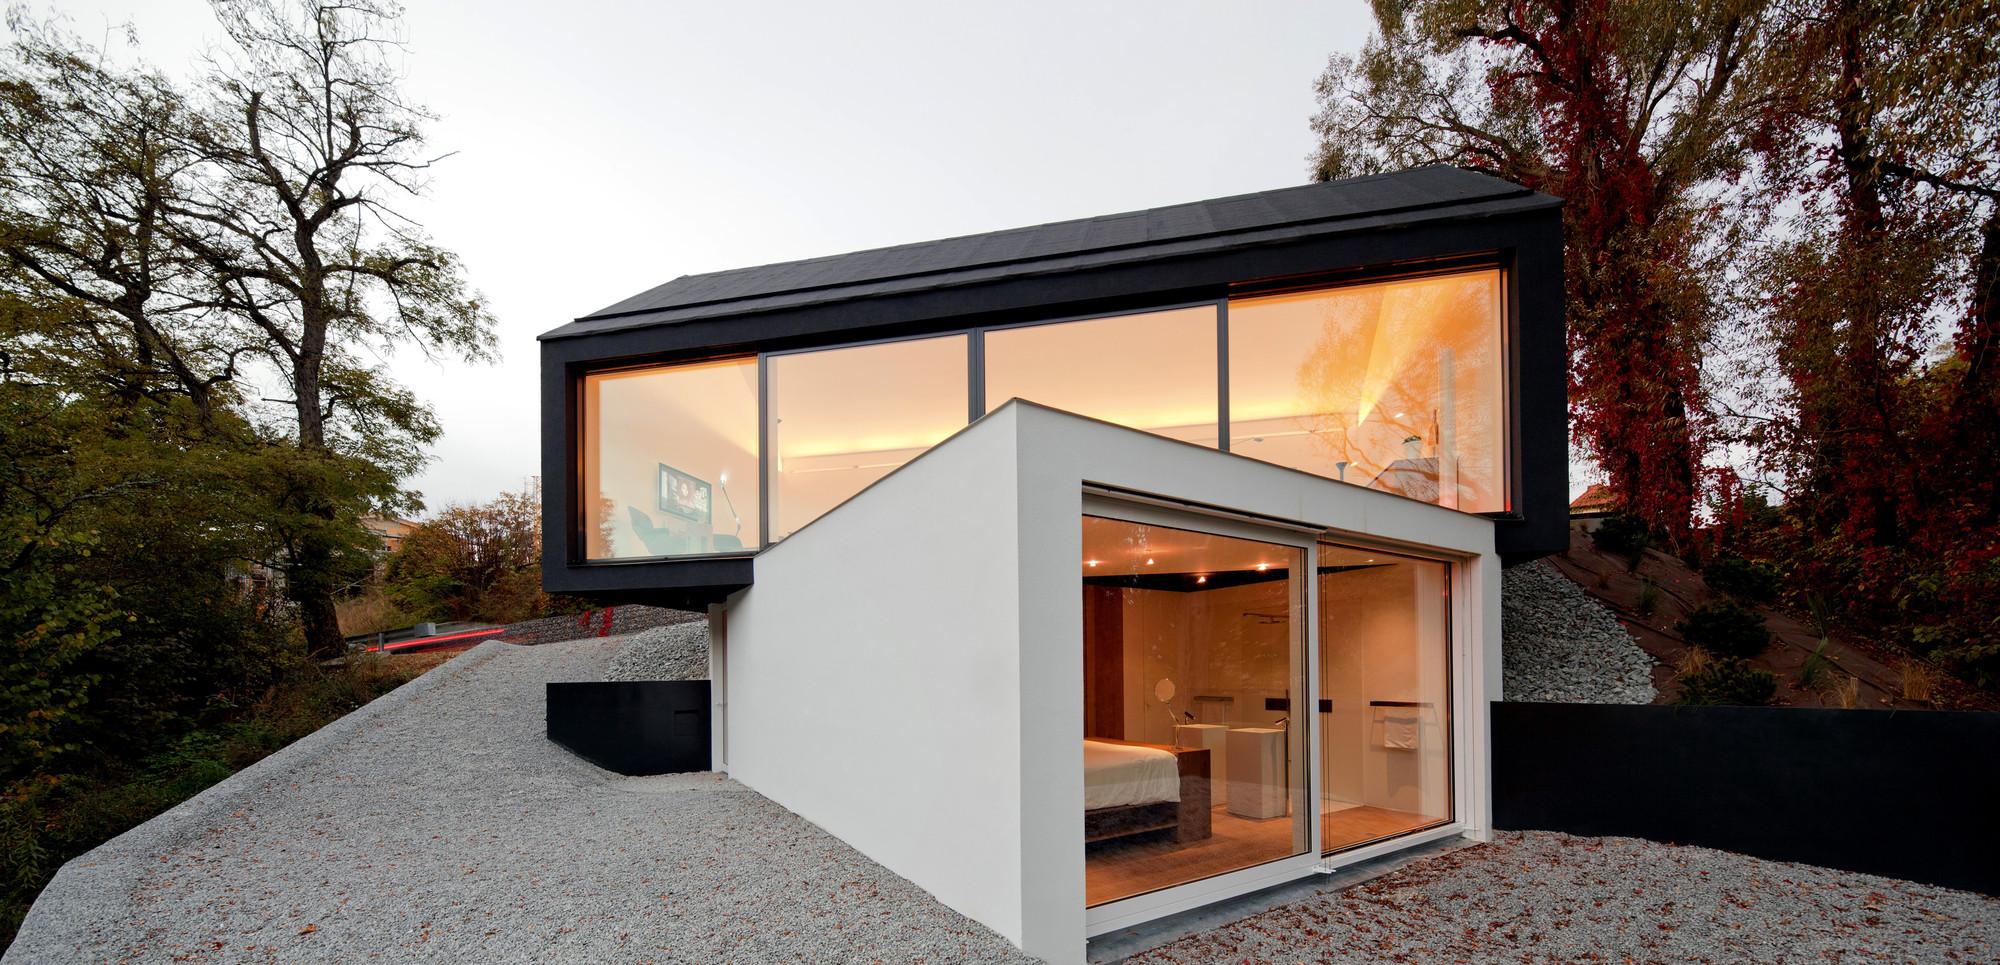 studio house fabi architekten bda archdaily. Black Bedroom Furniture Sets. Home Design Ideas